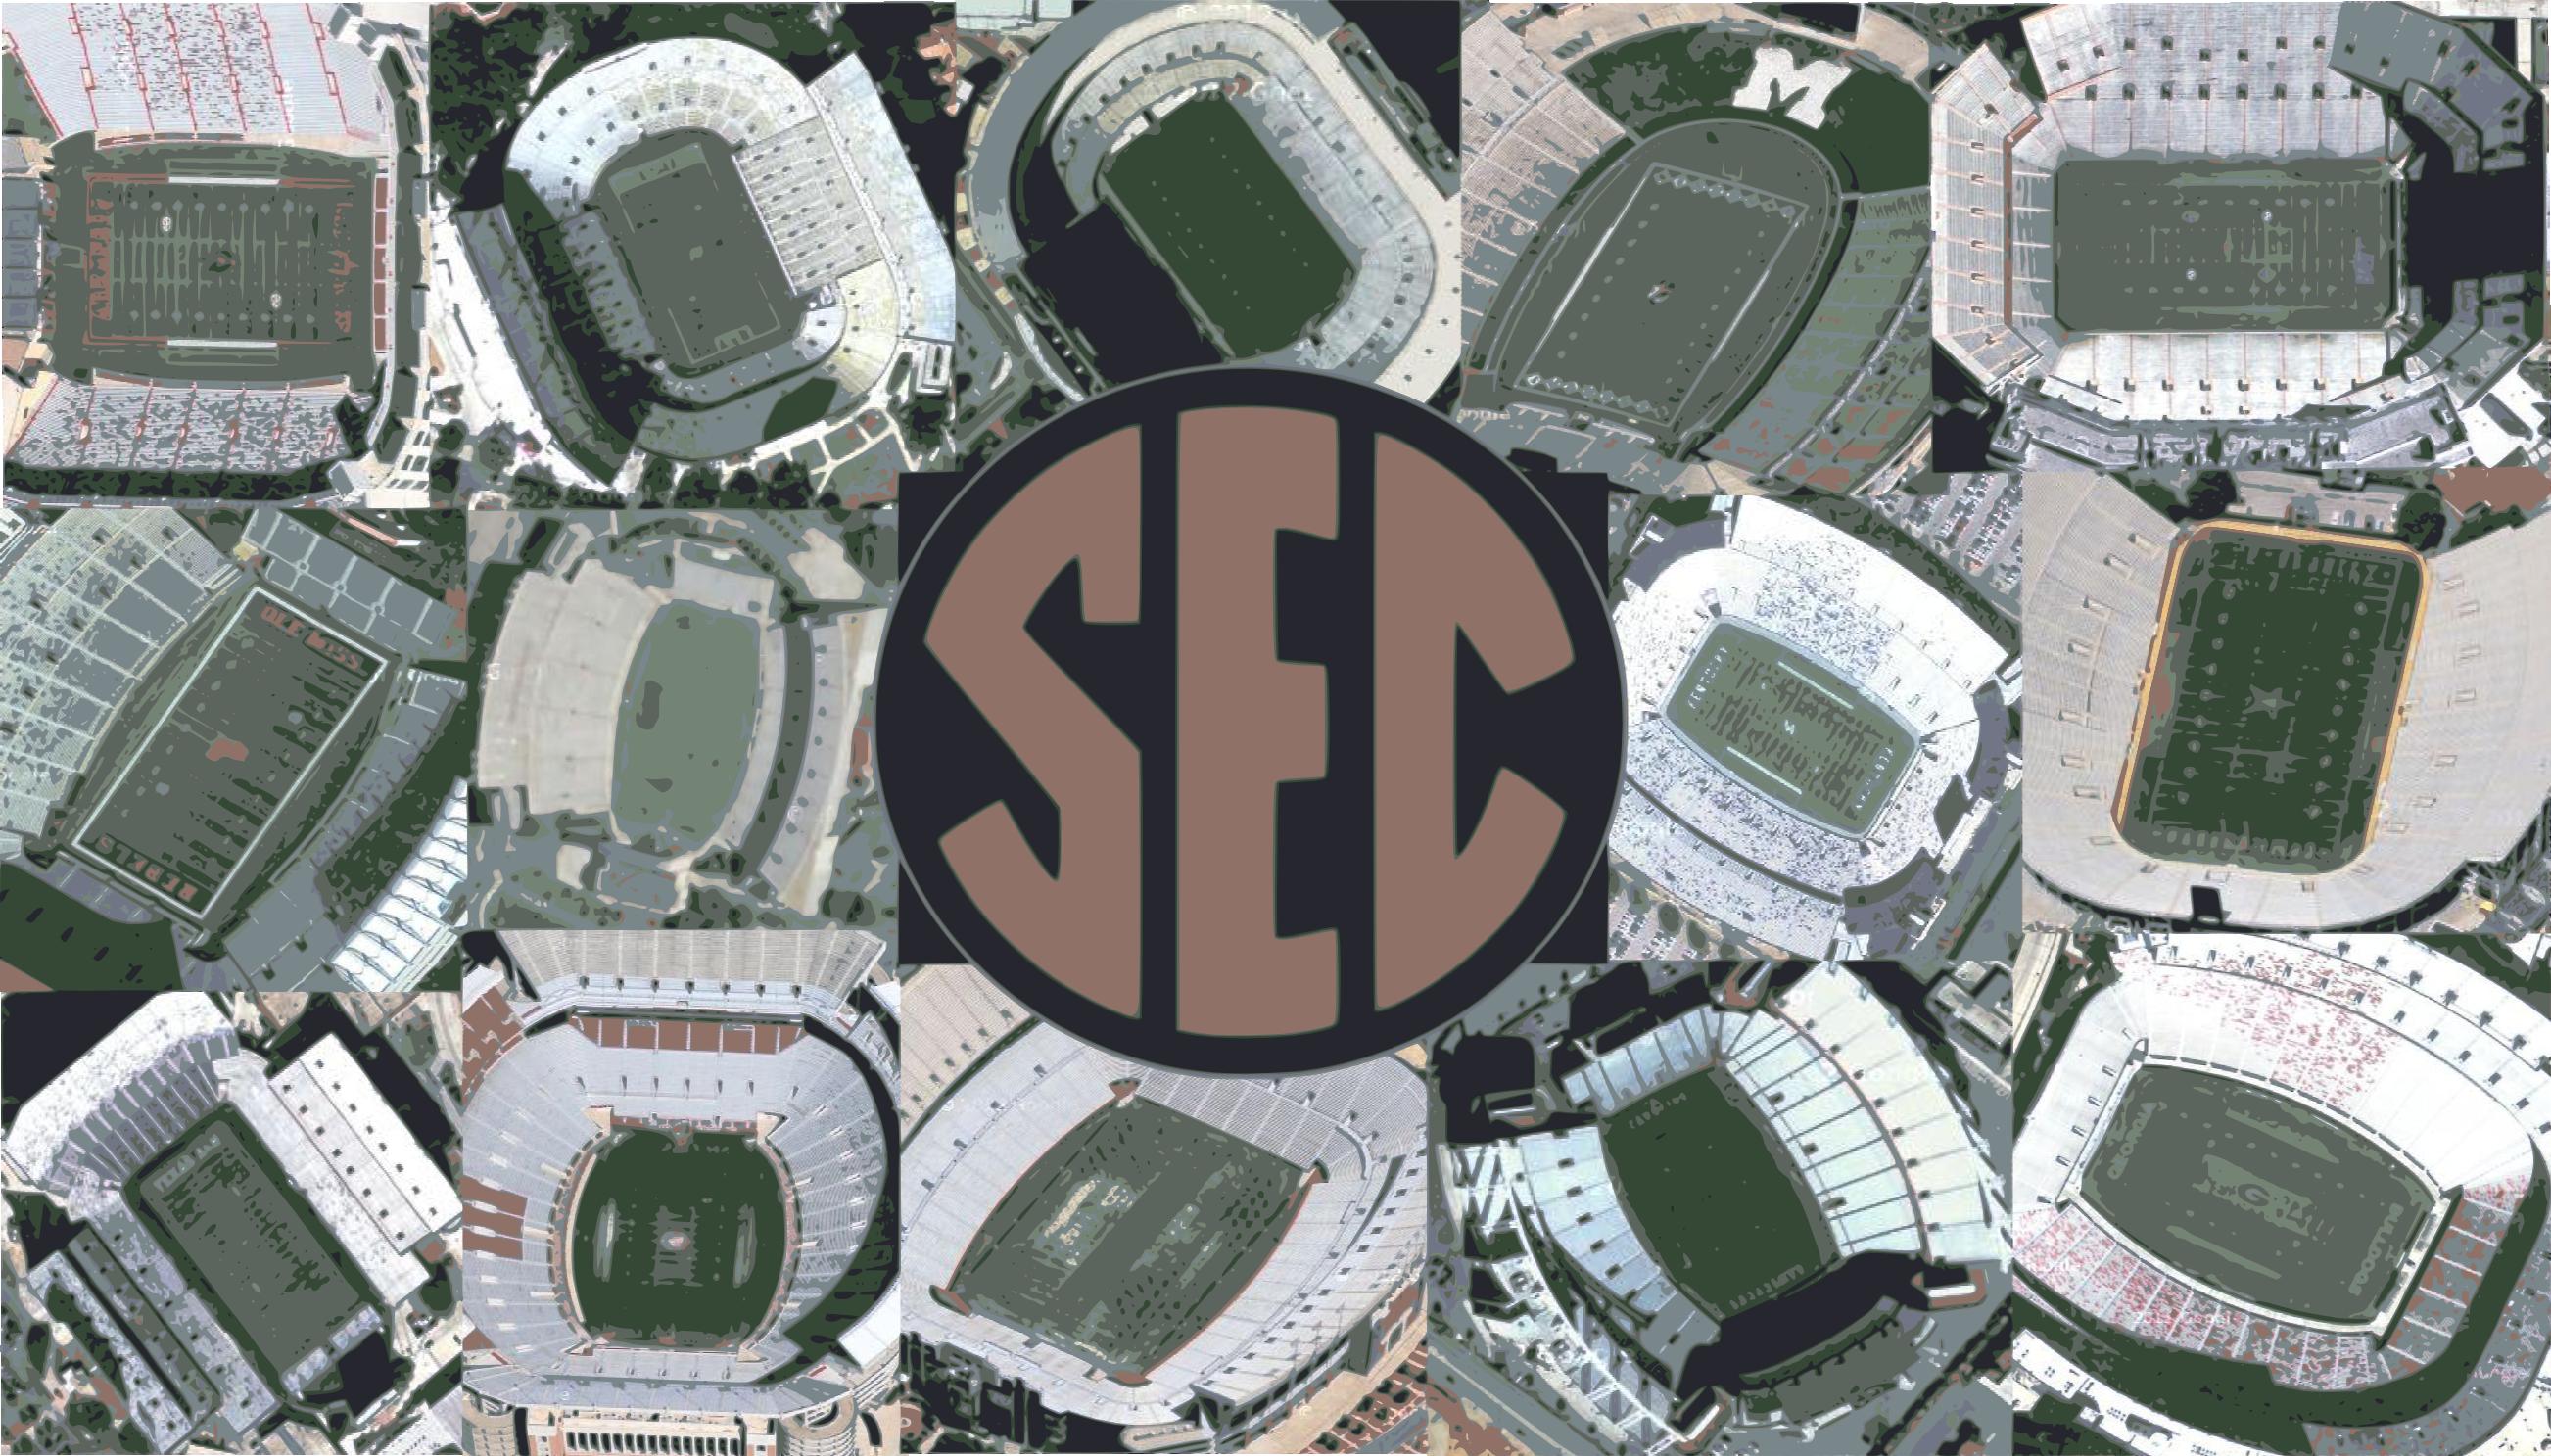 SEC Football Stadiums 2605x1487